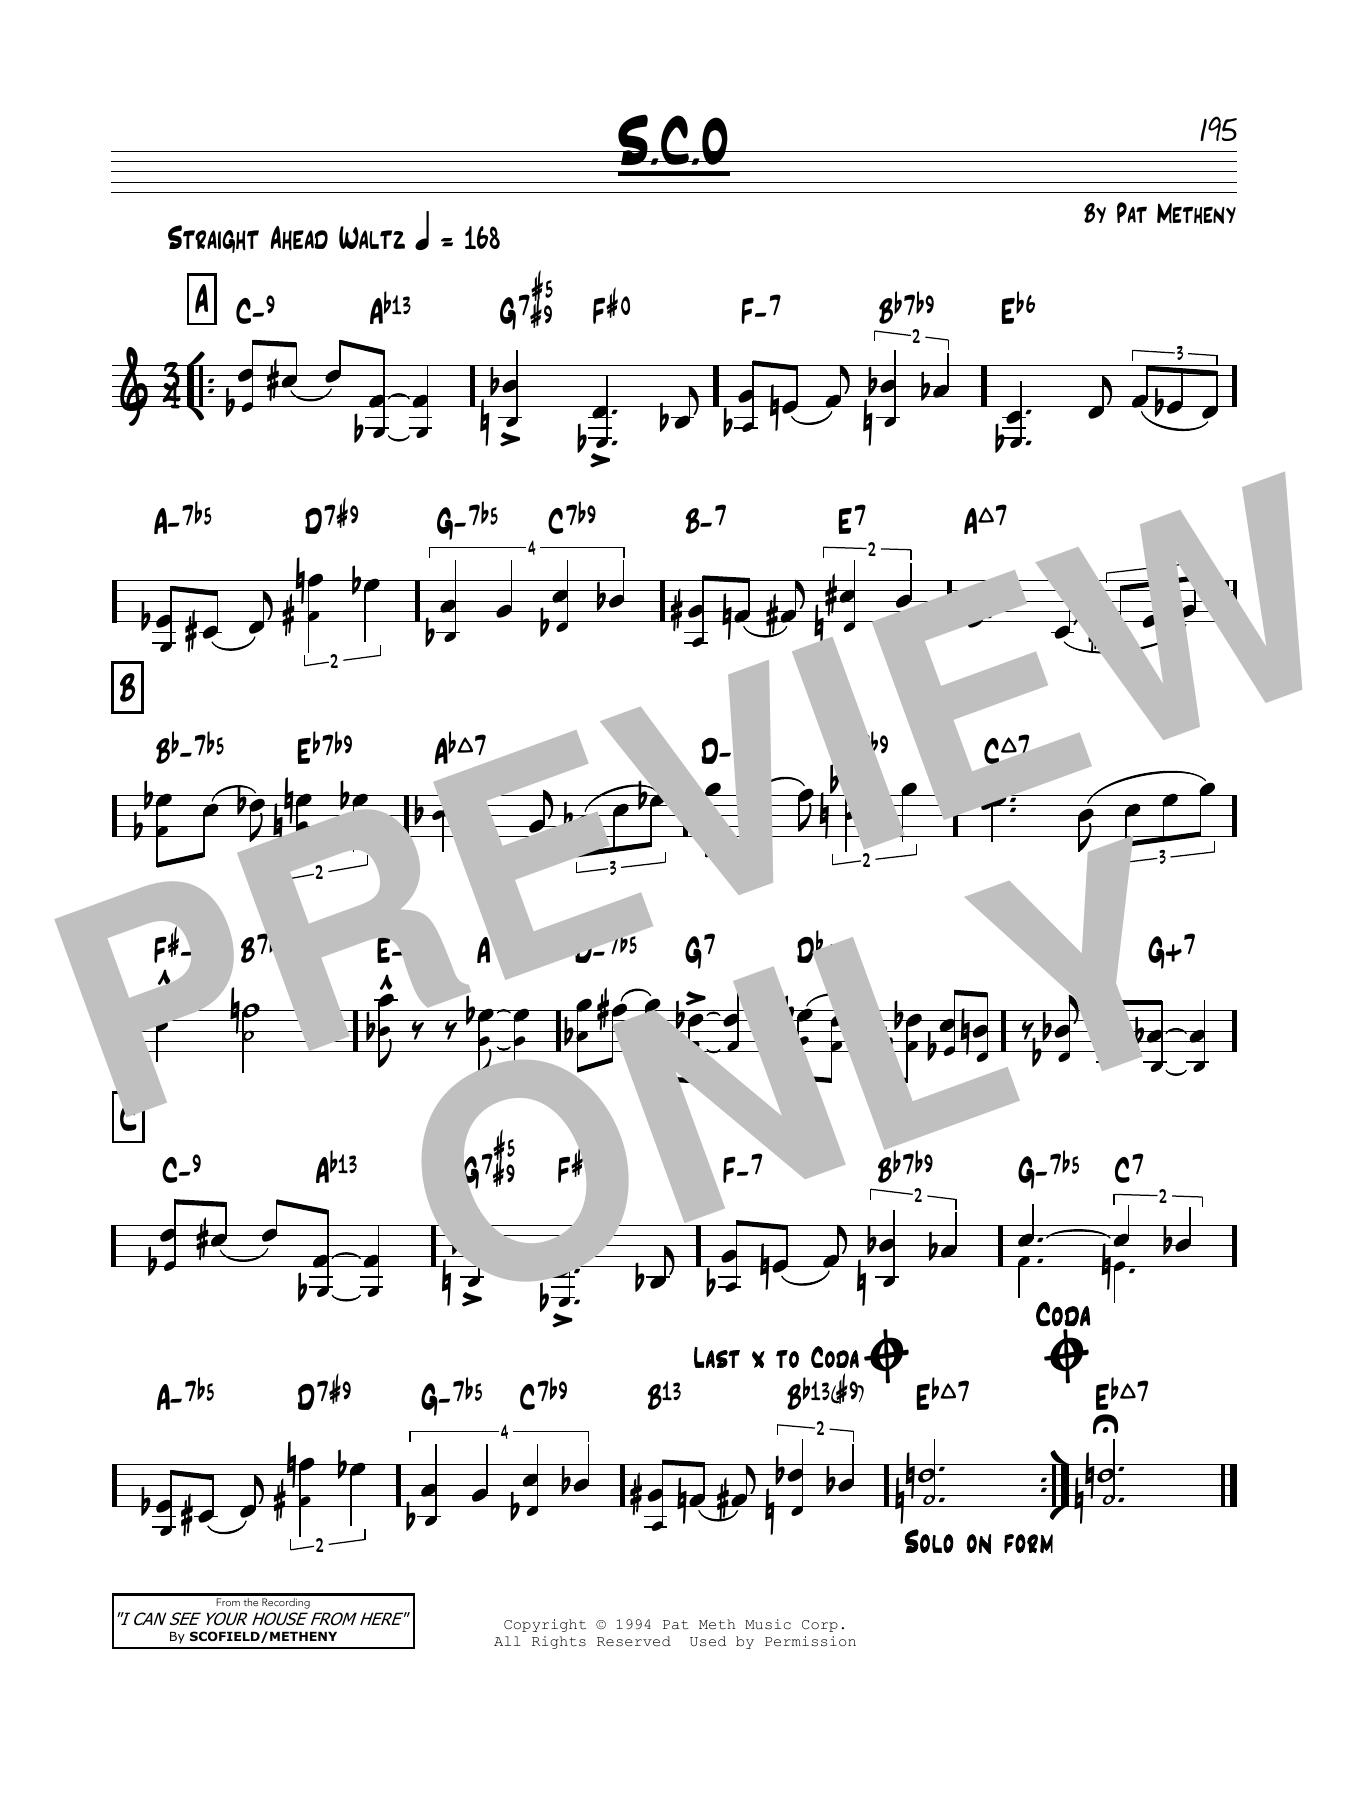 S.C.O. Sheet Music